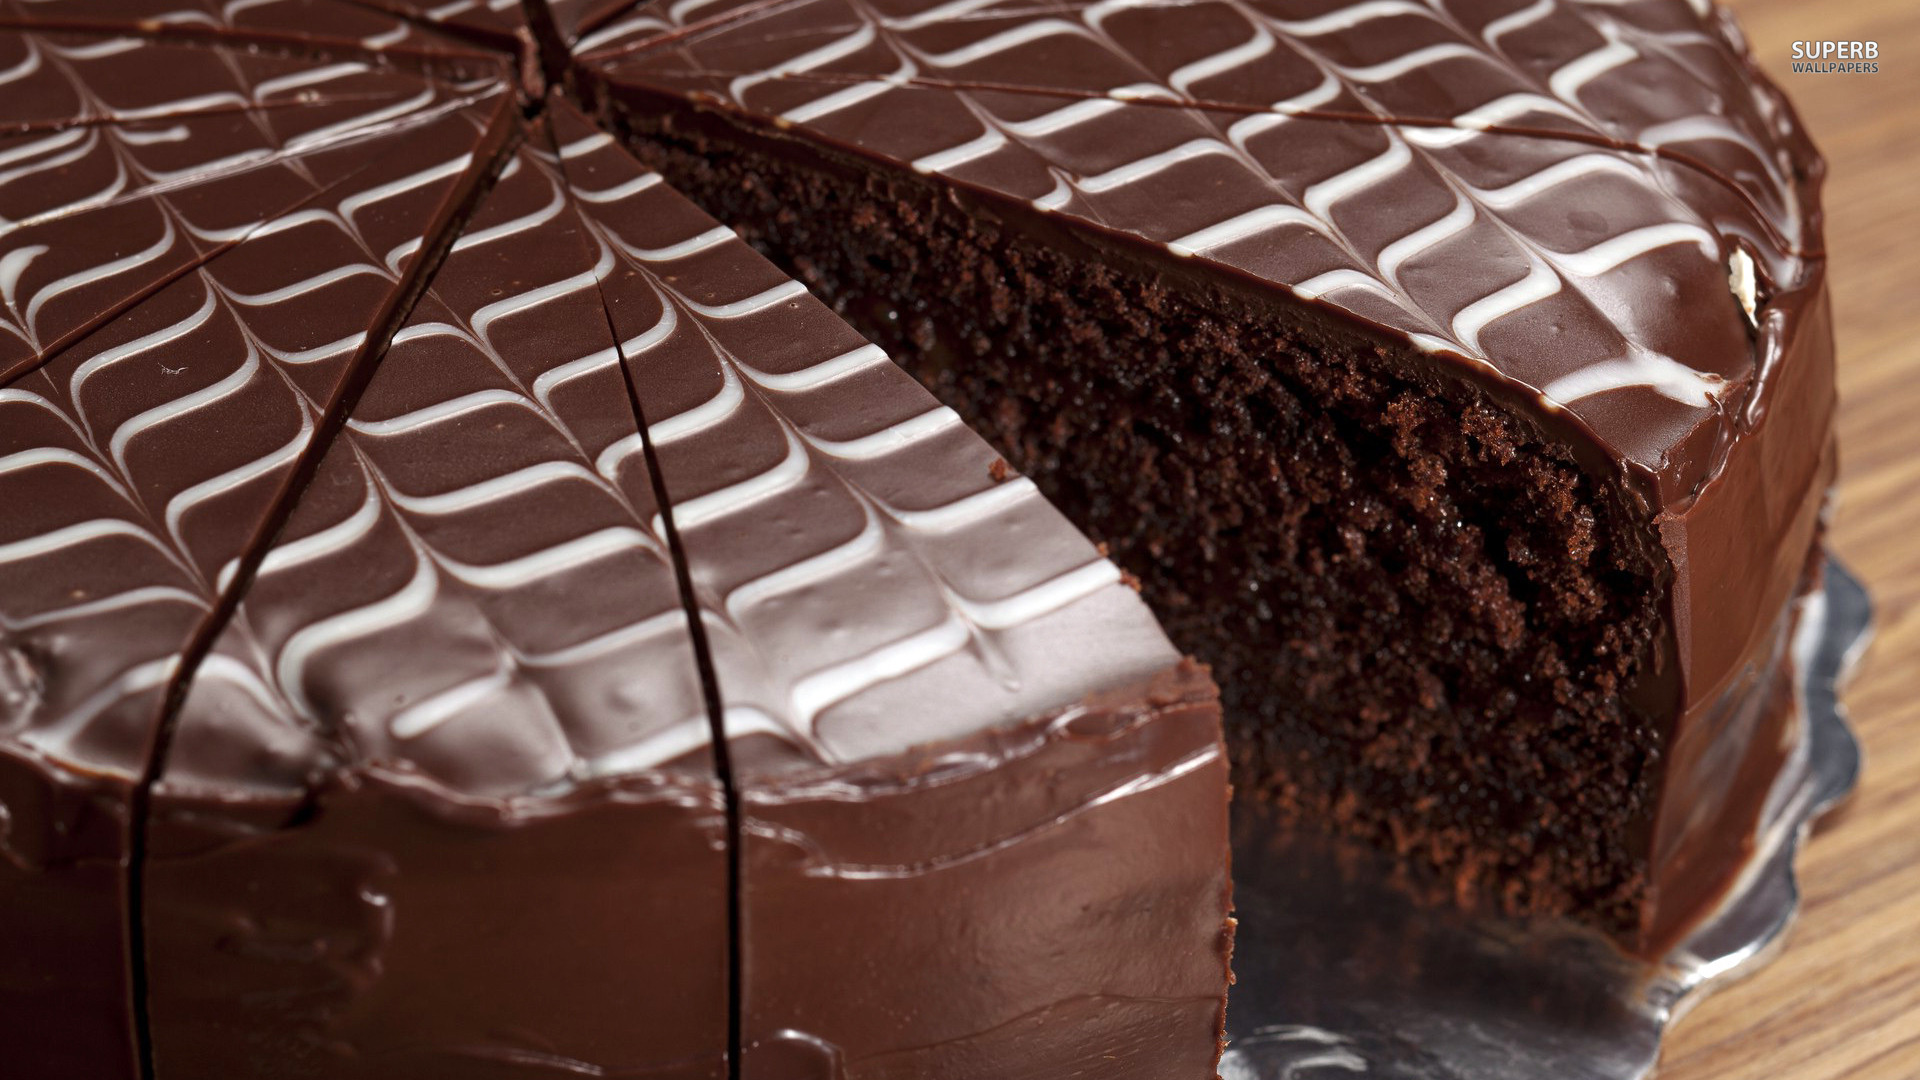 Chocolate Cake Wallpaper 25 Desktop Wallpaper 1920x1080